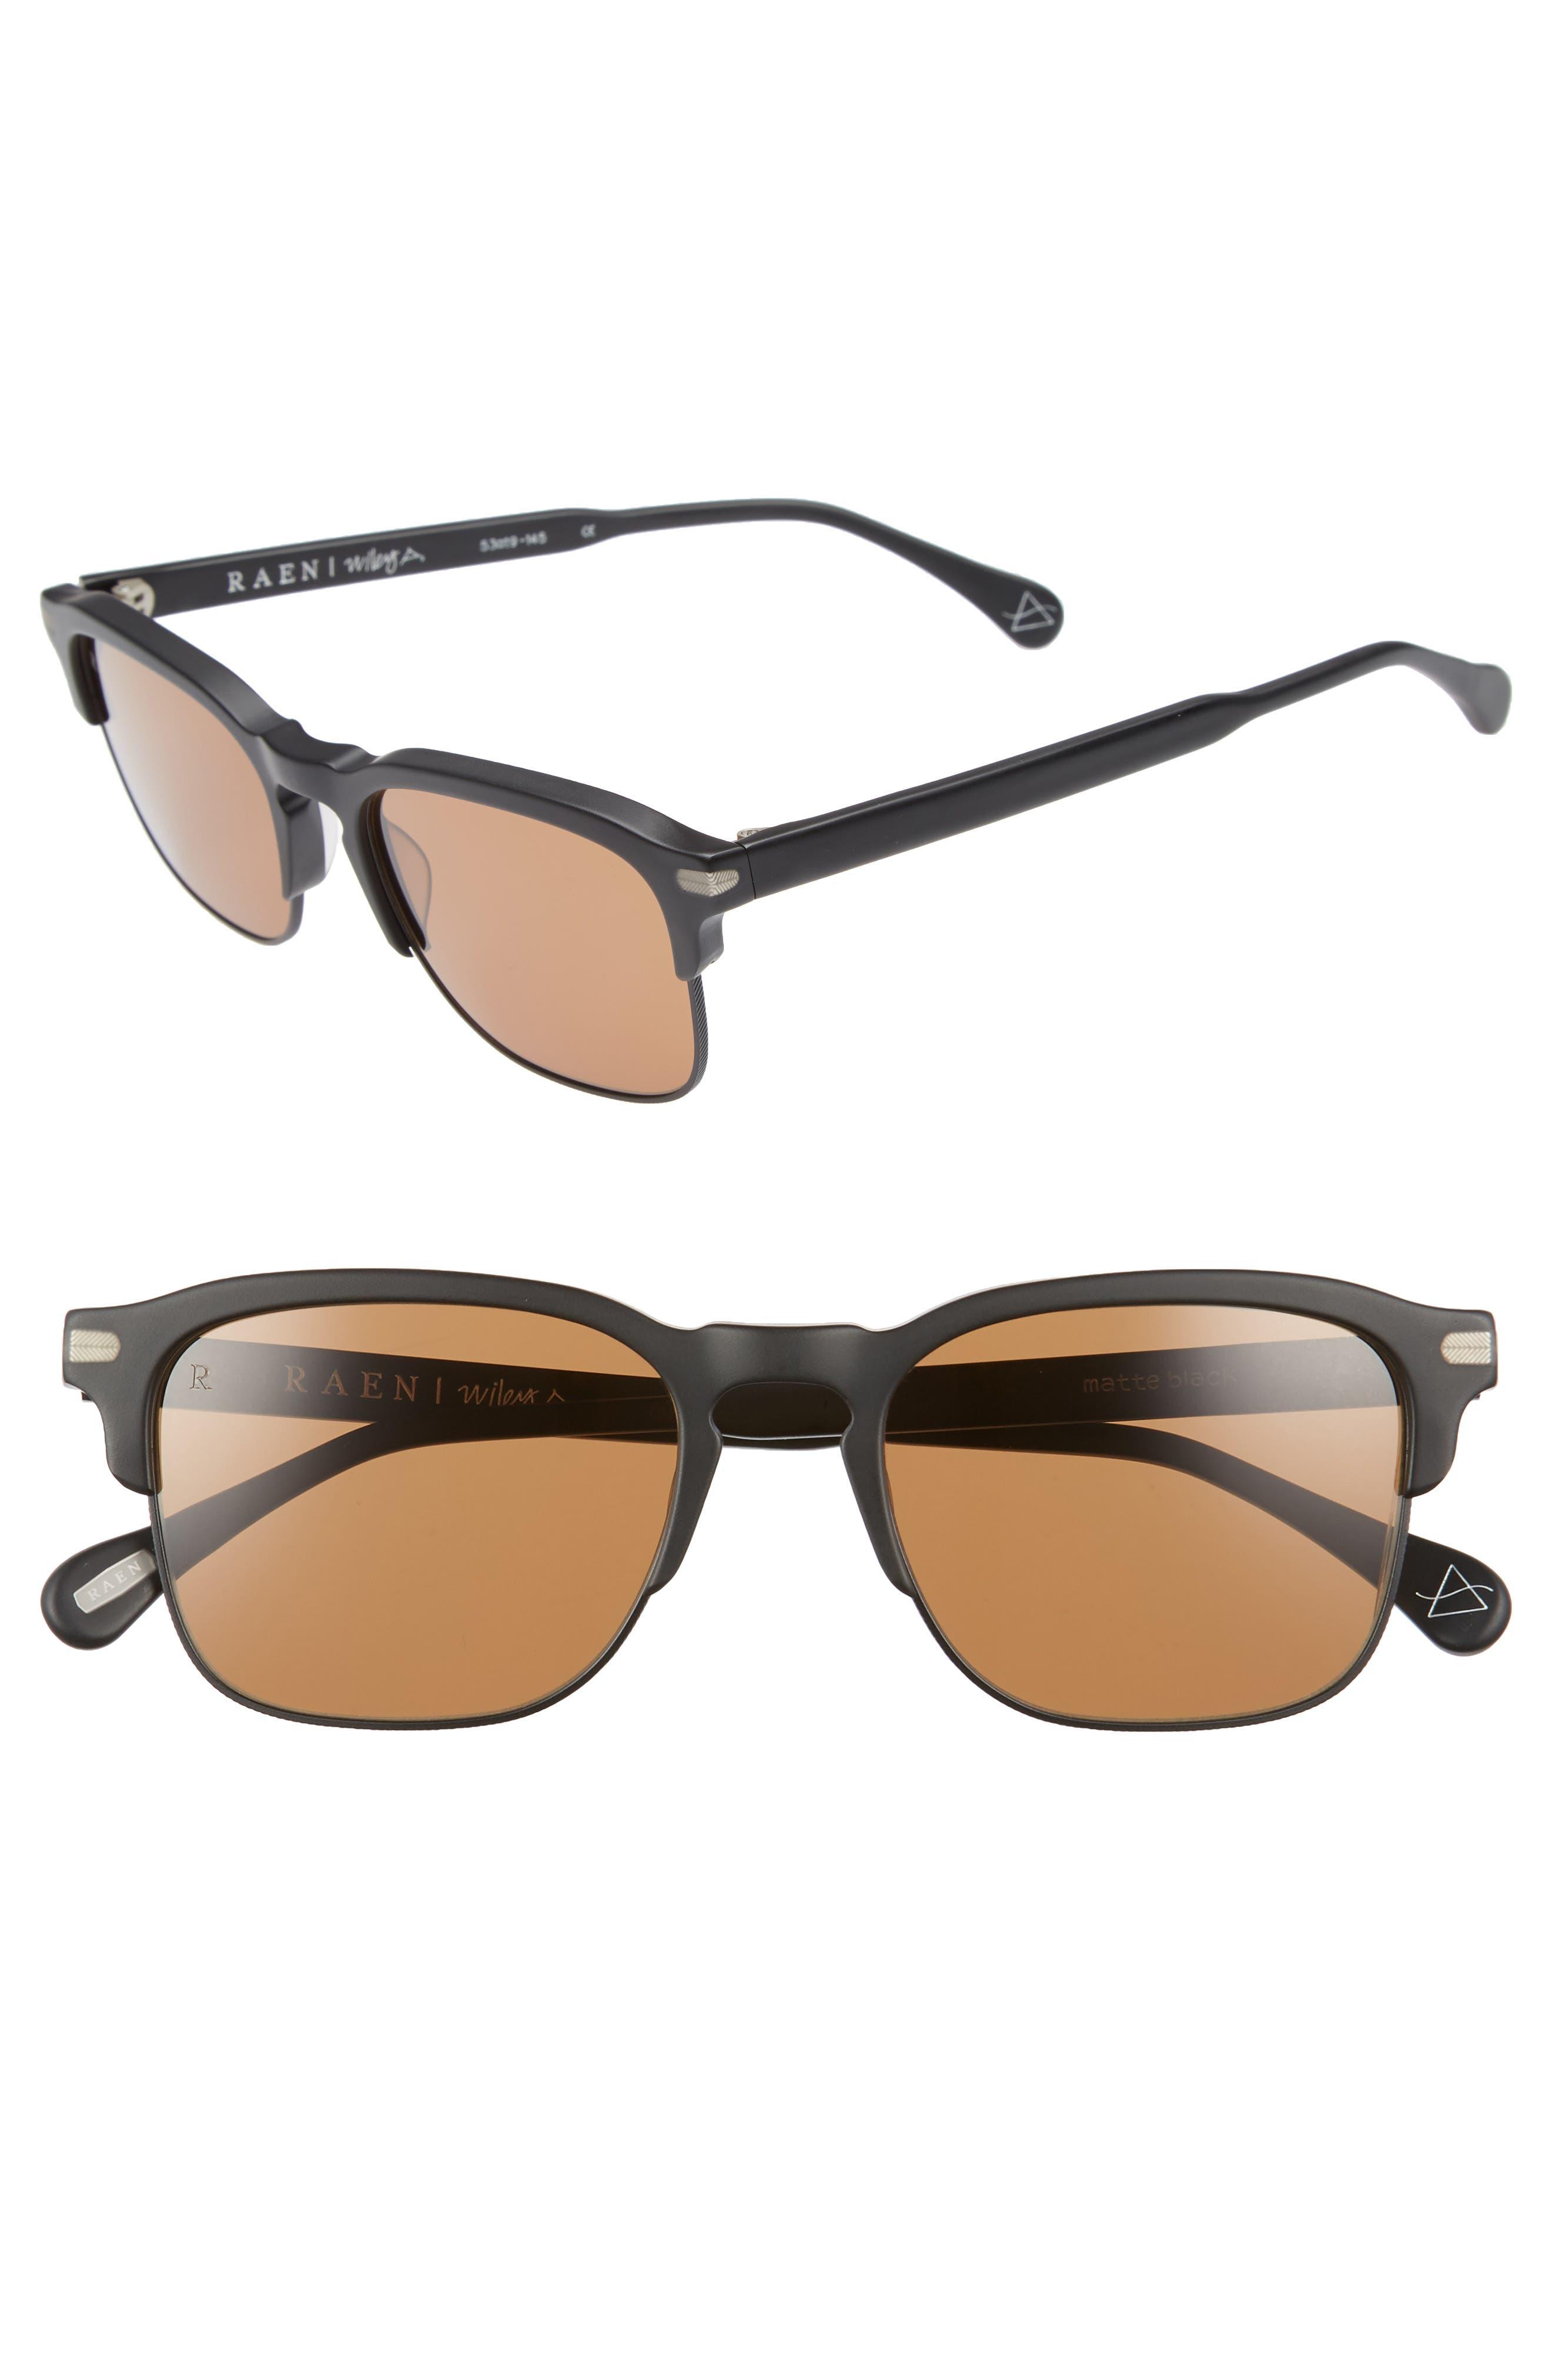 Wiley A 53mm Sunglasses,                         Main,                         color, Matte Black